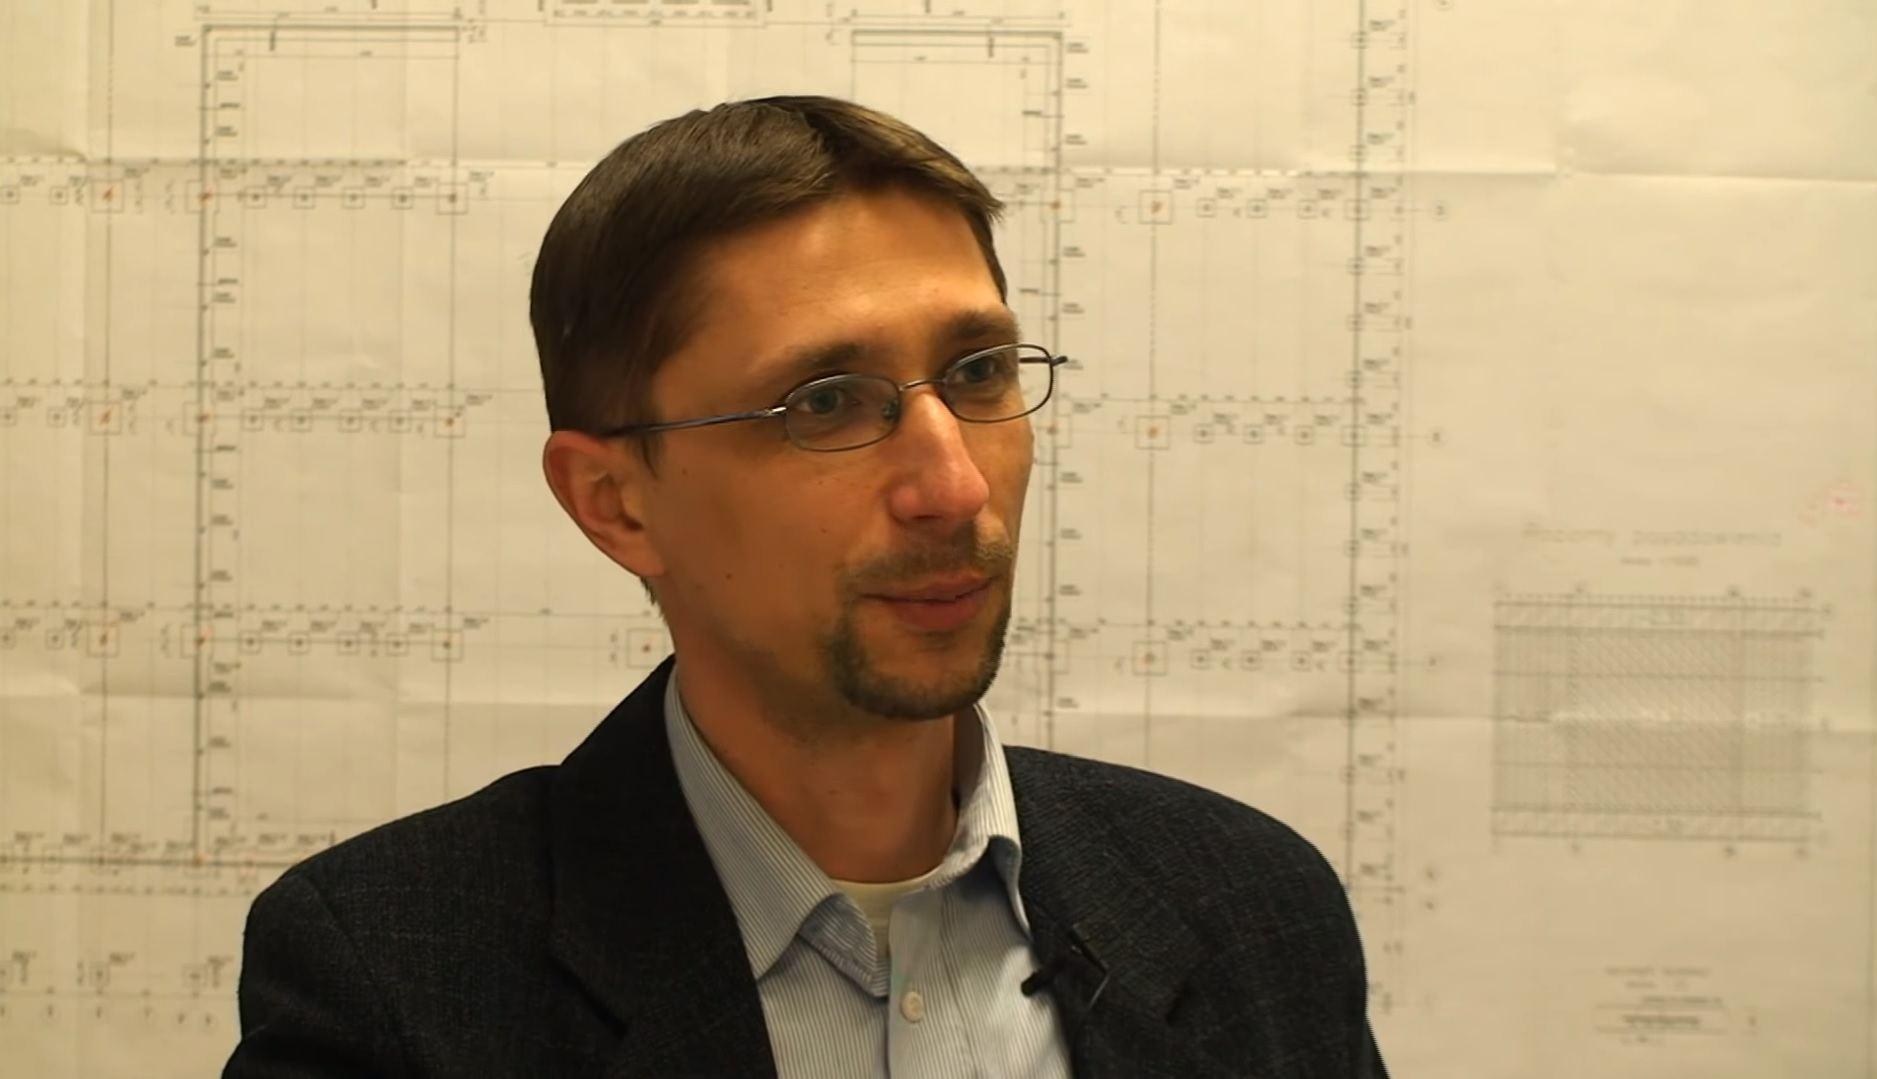 Grzegorz Borucki